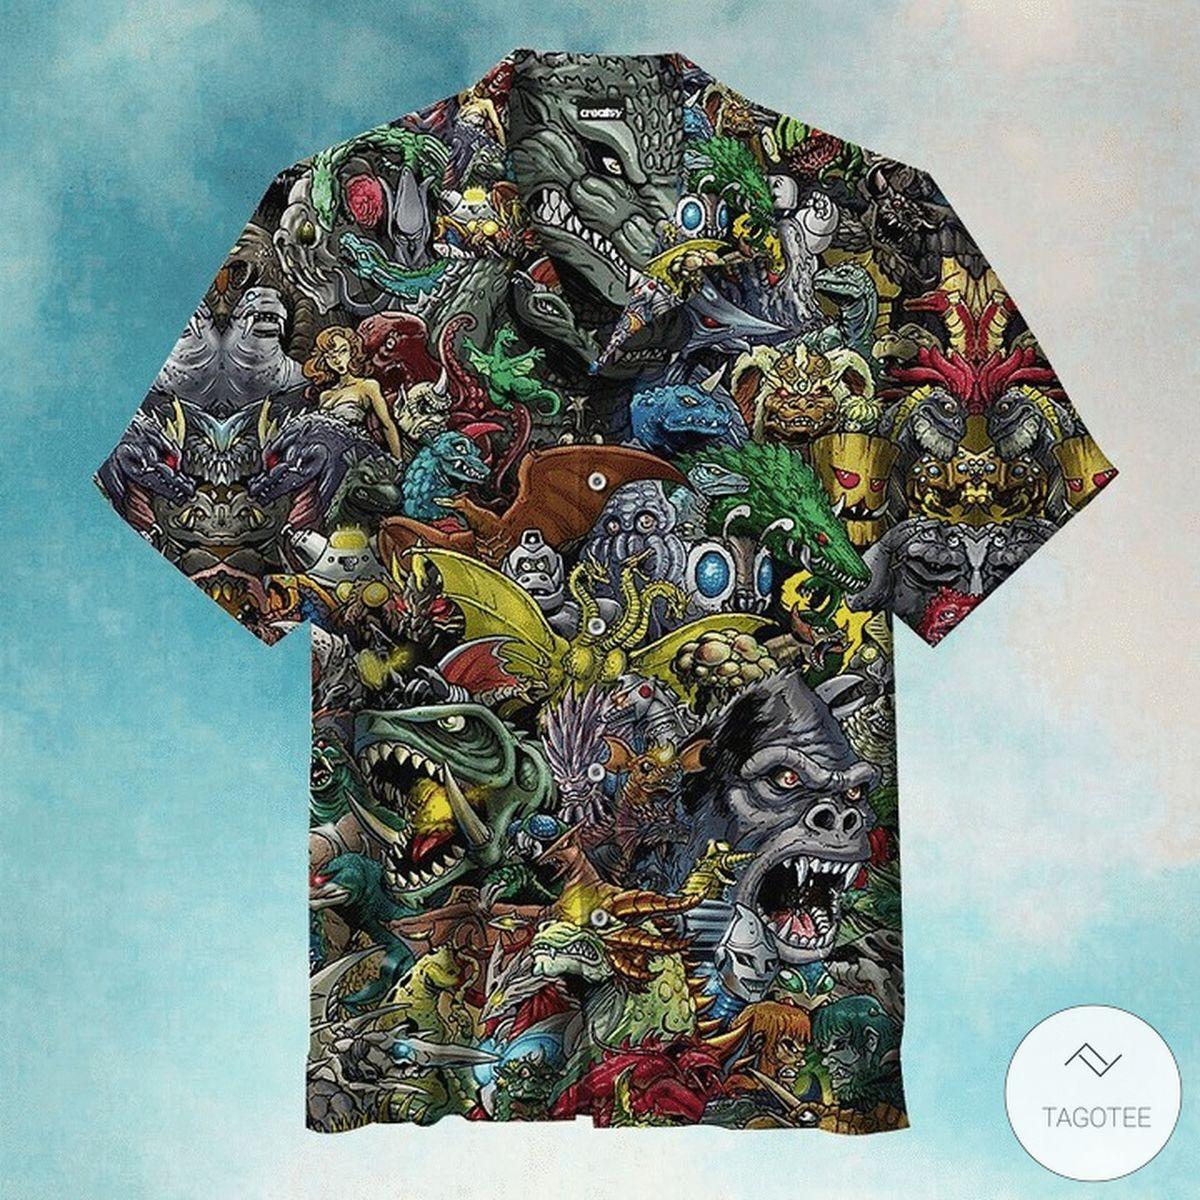 Amazing Welcome To The World Of Godzilla Hawaiian Shirt